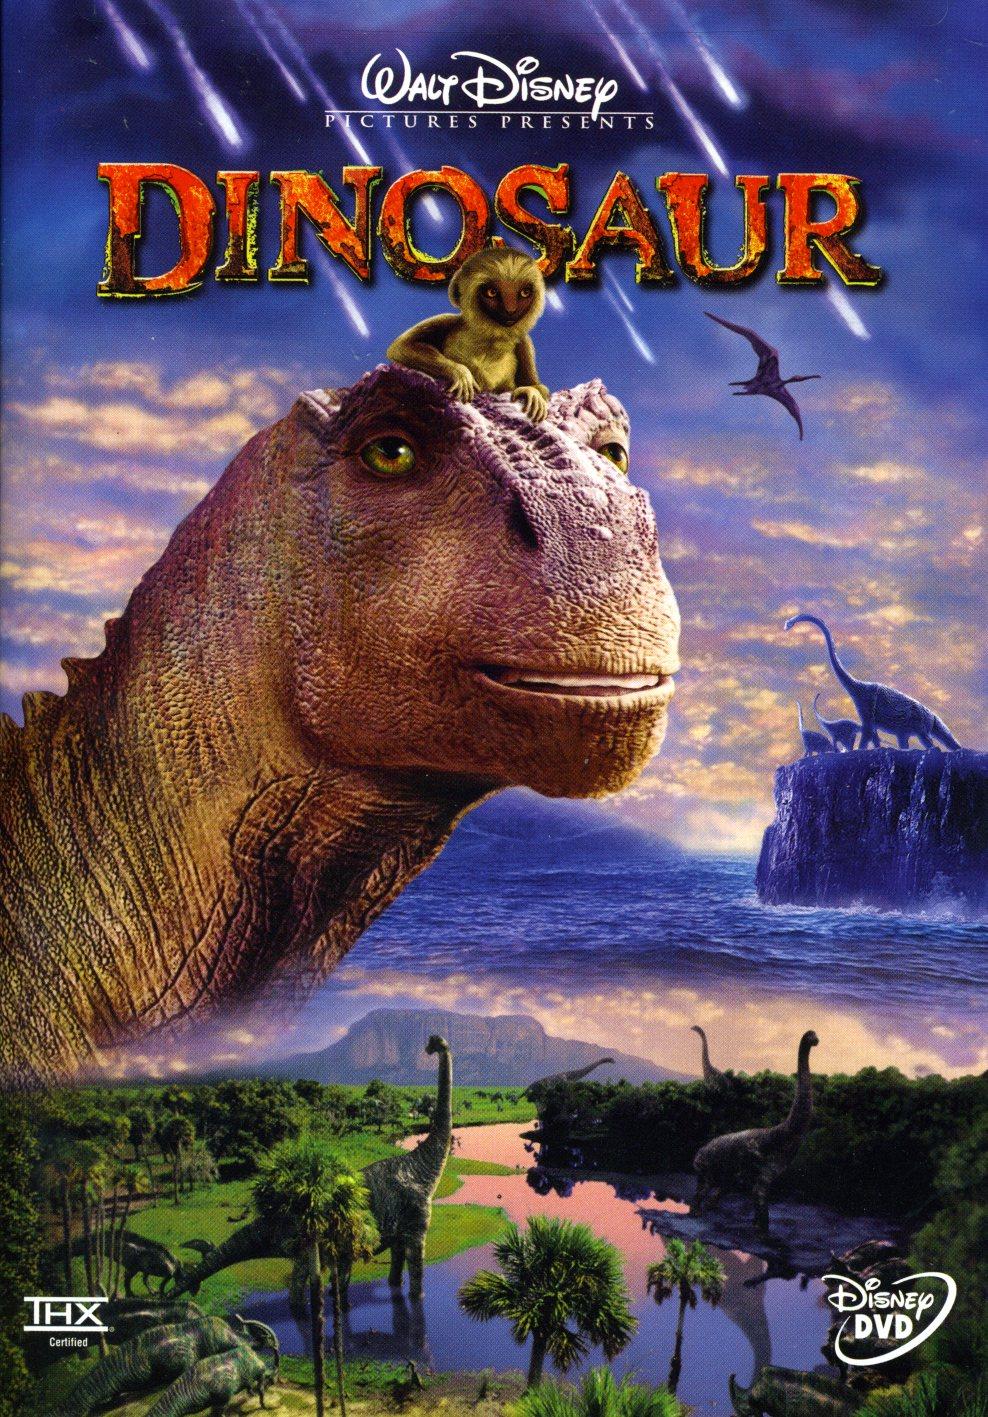 Disney Family Fun Days: Disney's Dinosaur - March 1, 2013